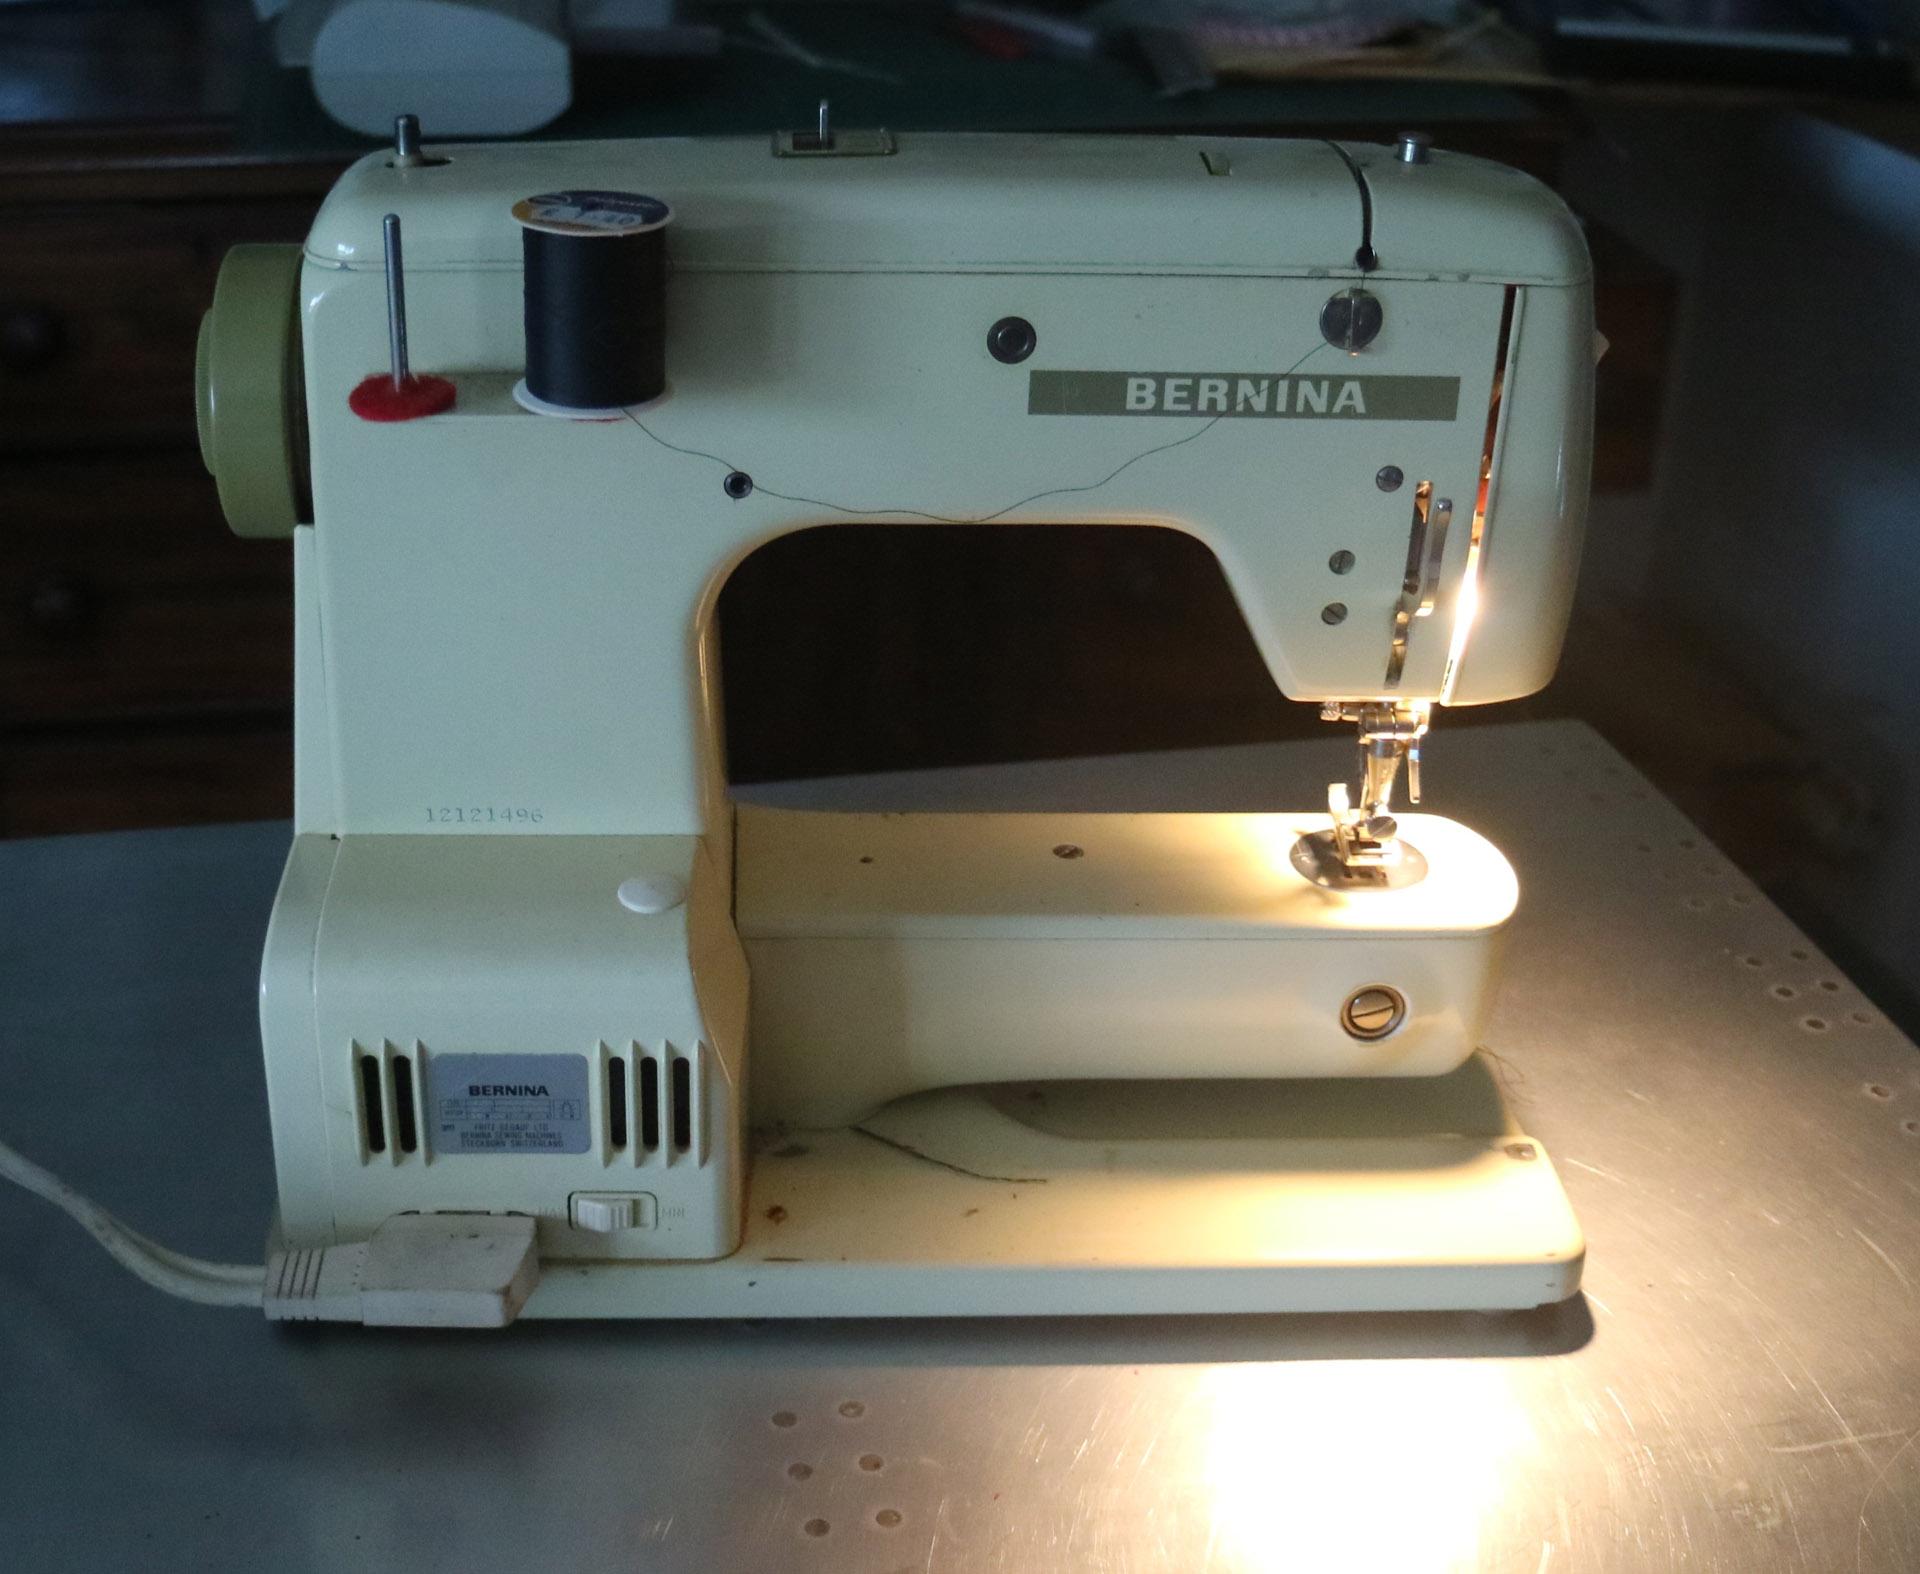 Tim Hunkin's Bernina sewing machine.